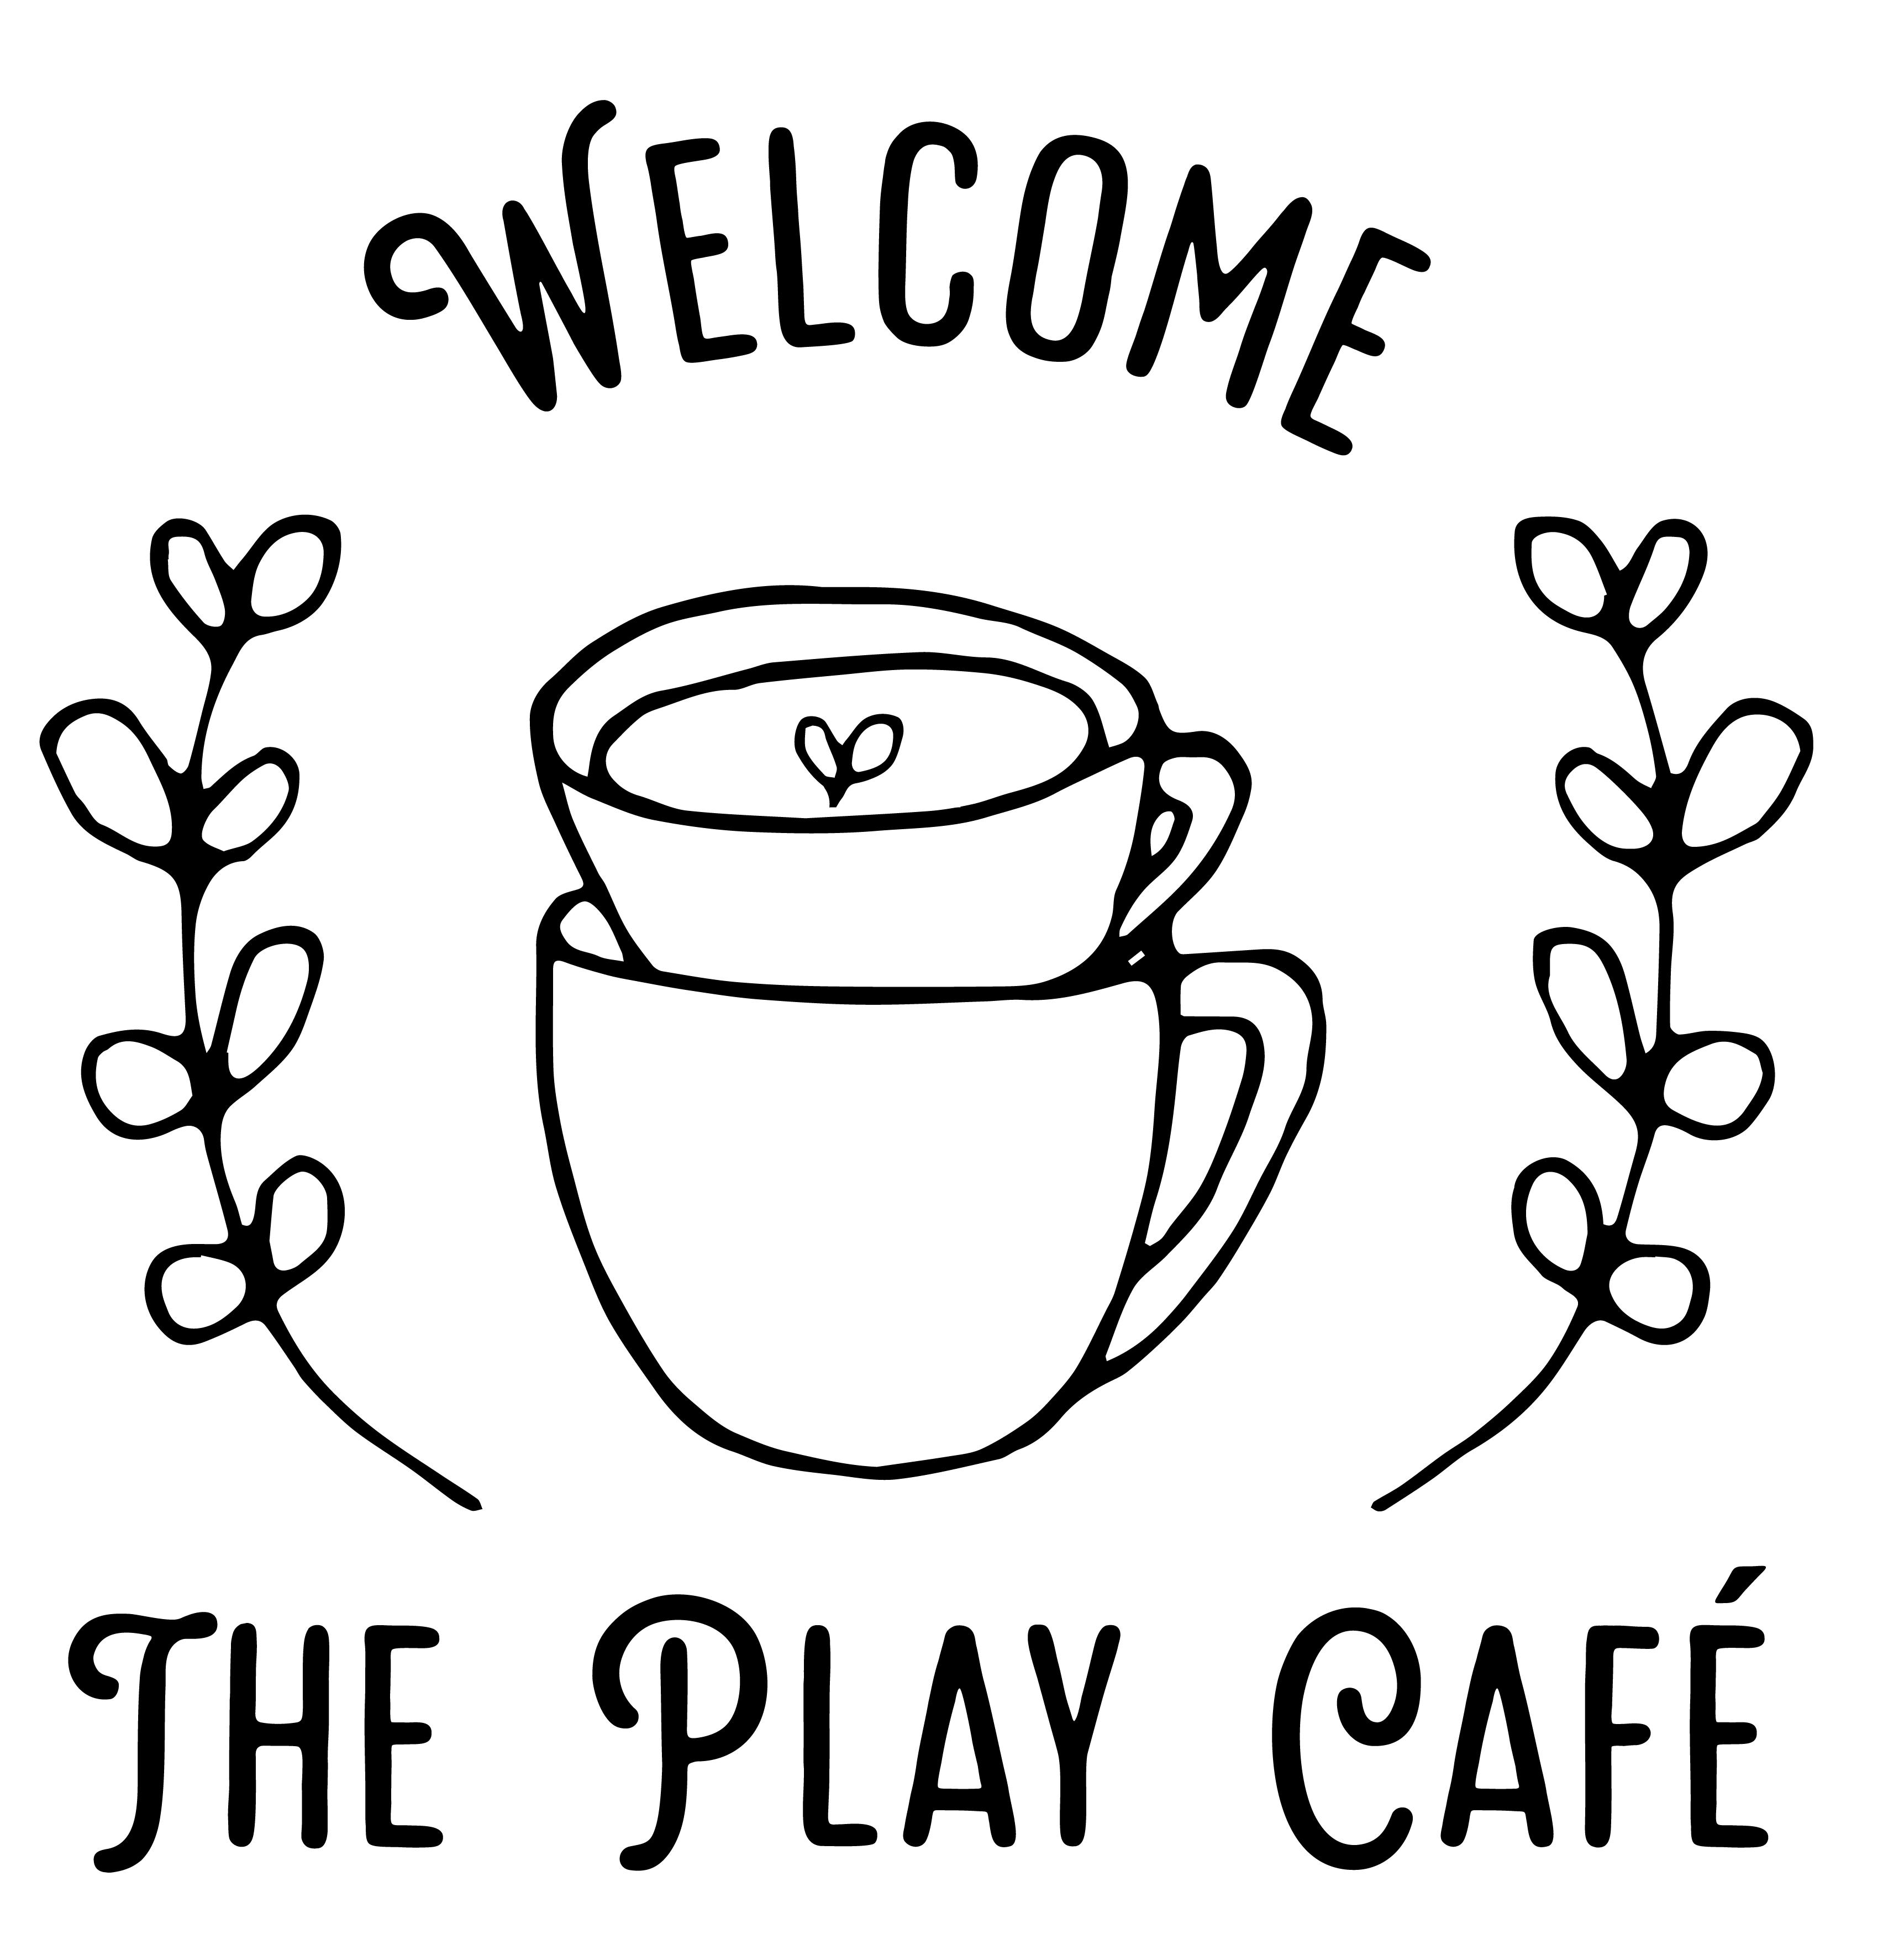 Play cafe logo